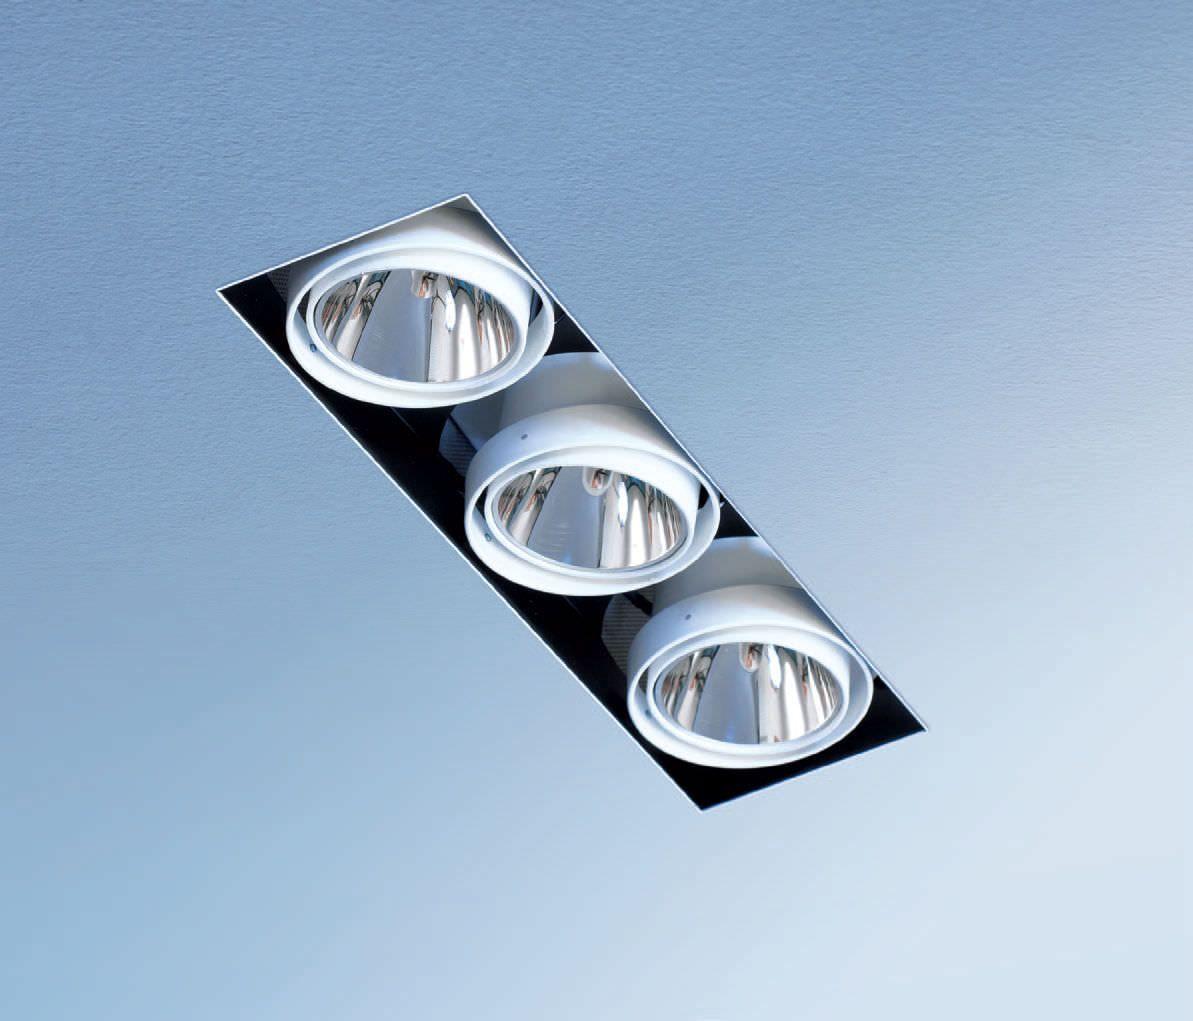 spot encastr de plafond led orientable midpoint q lightnet gmbh tb 0614. Black Bedroom Furniture Sets. Home Design Ideas